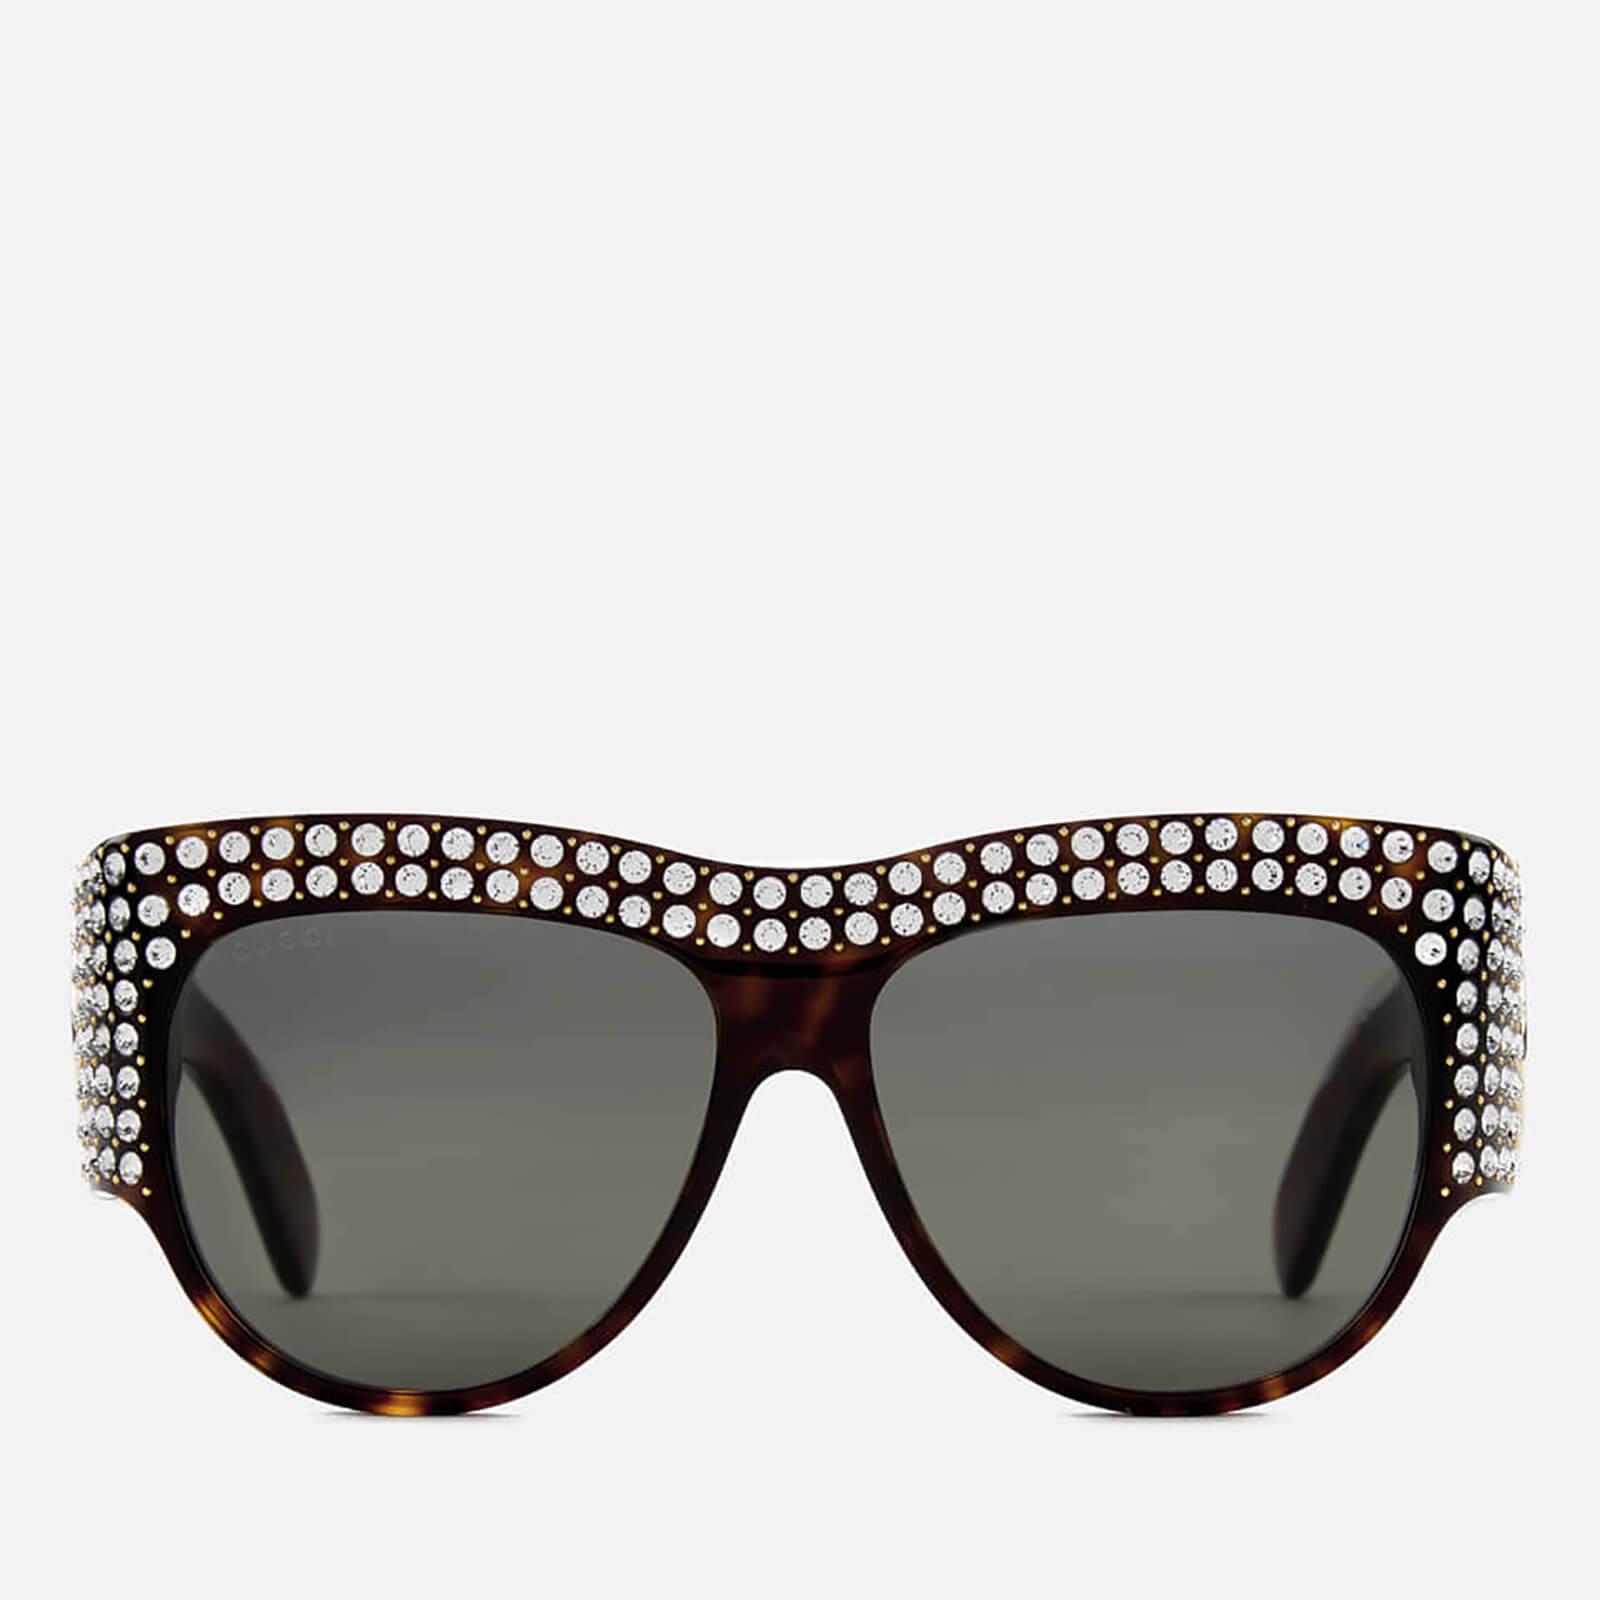 c0713c336ec Gucci Women s Crystal Oval Sunglasses - Havana Grey - Free UK Delivery over  £50